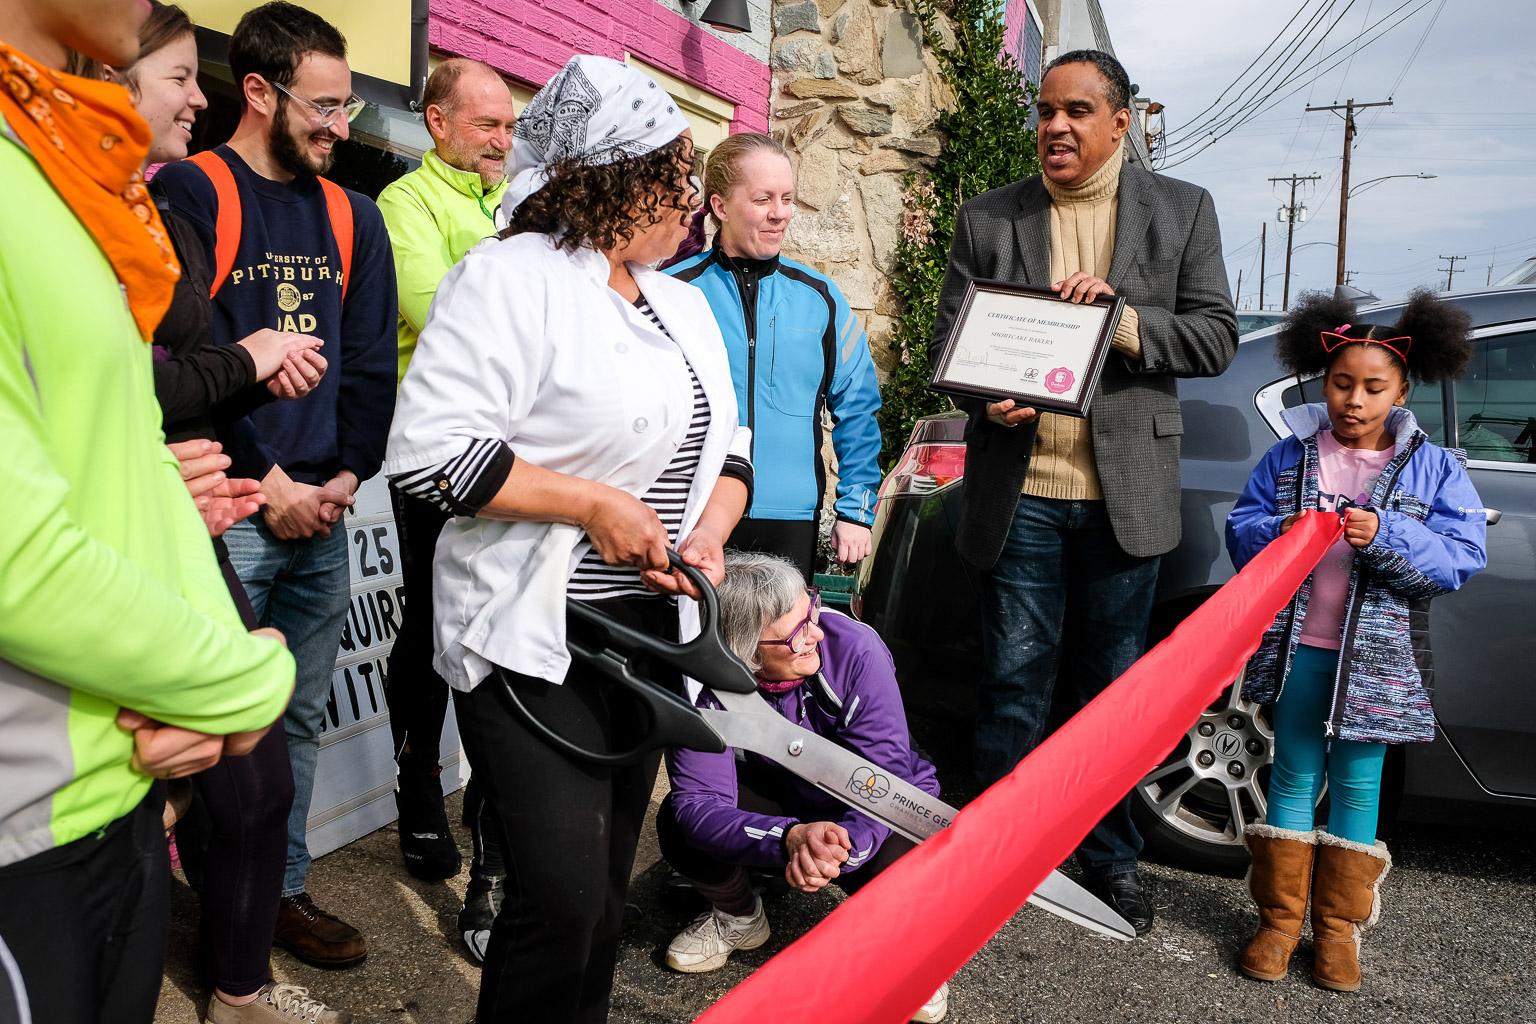 Shortcake_Reopening_11-18-17-039-Lenzy-Ruffin-Event-Photography-Washington-DC-Fuji-X-T2.jpg